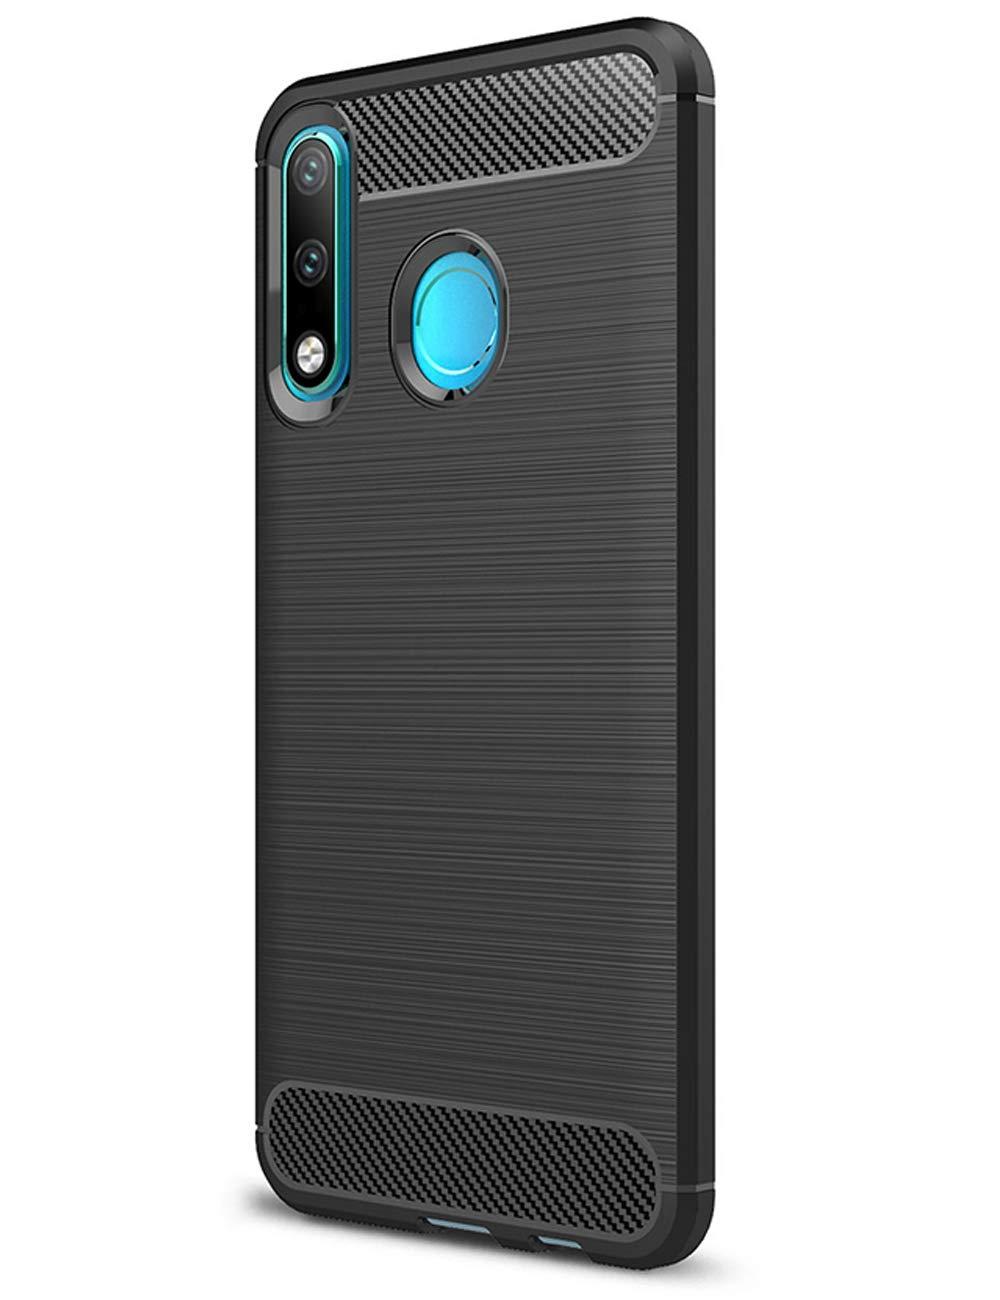 Coque-Etui-Housse-Silicone-brossee-Fibre-de-carbone-Noir-Protection-Huawei miniature 36